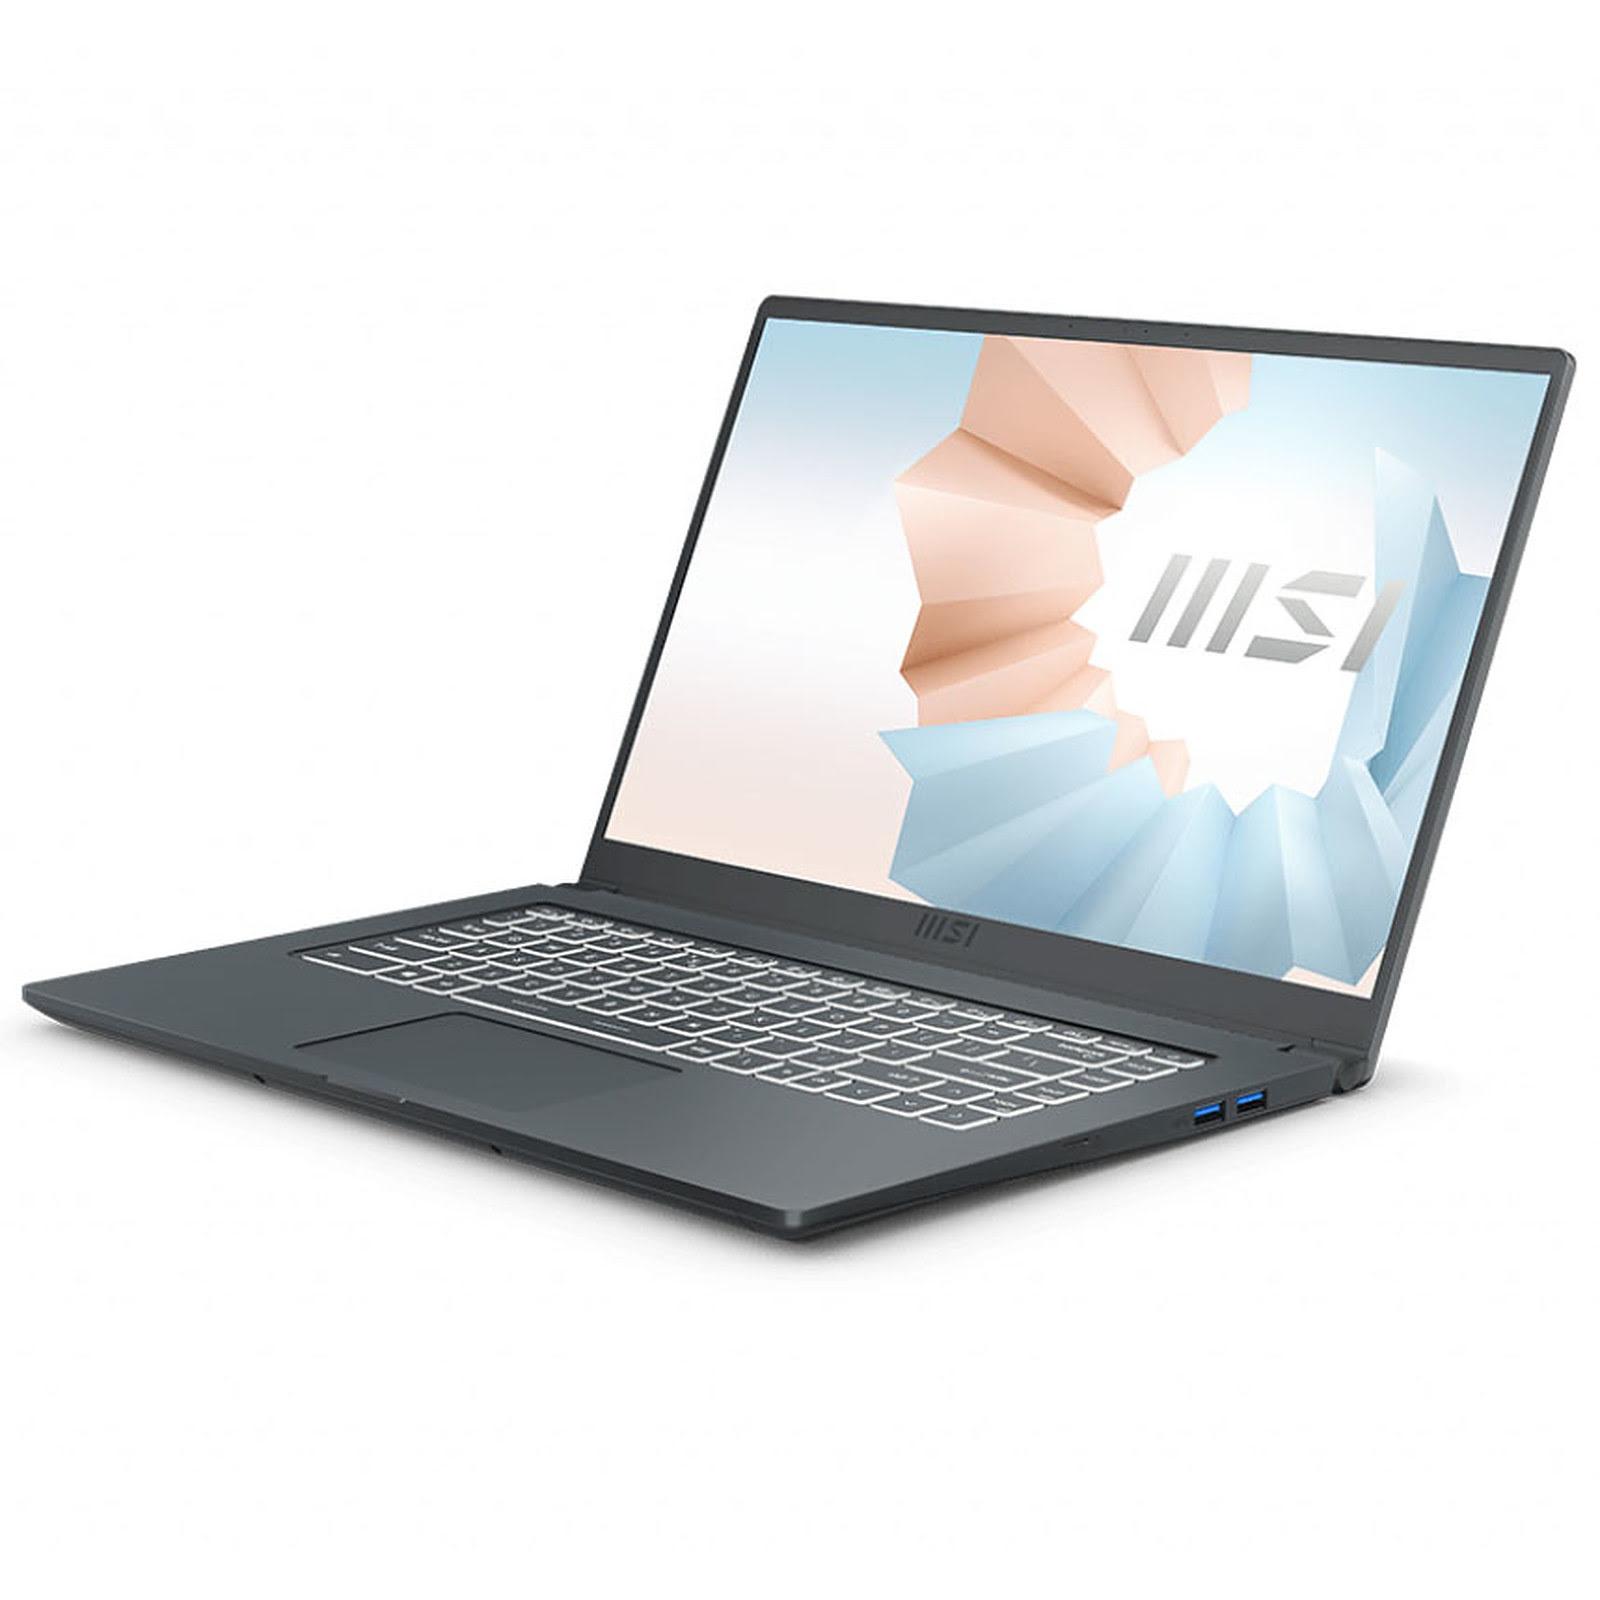 MSI 9S7-155226-052 - PC portable MSI - Cybertek.fr - 2